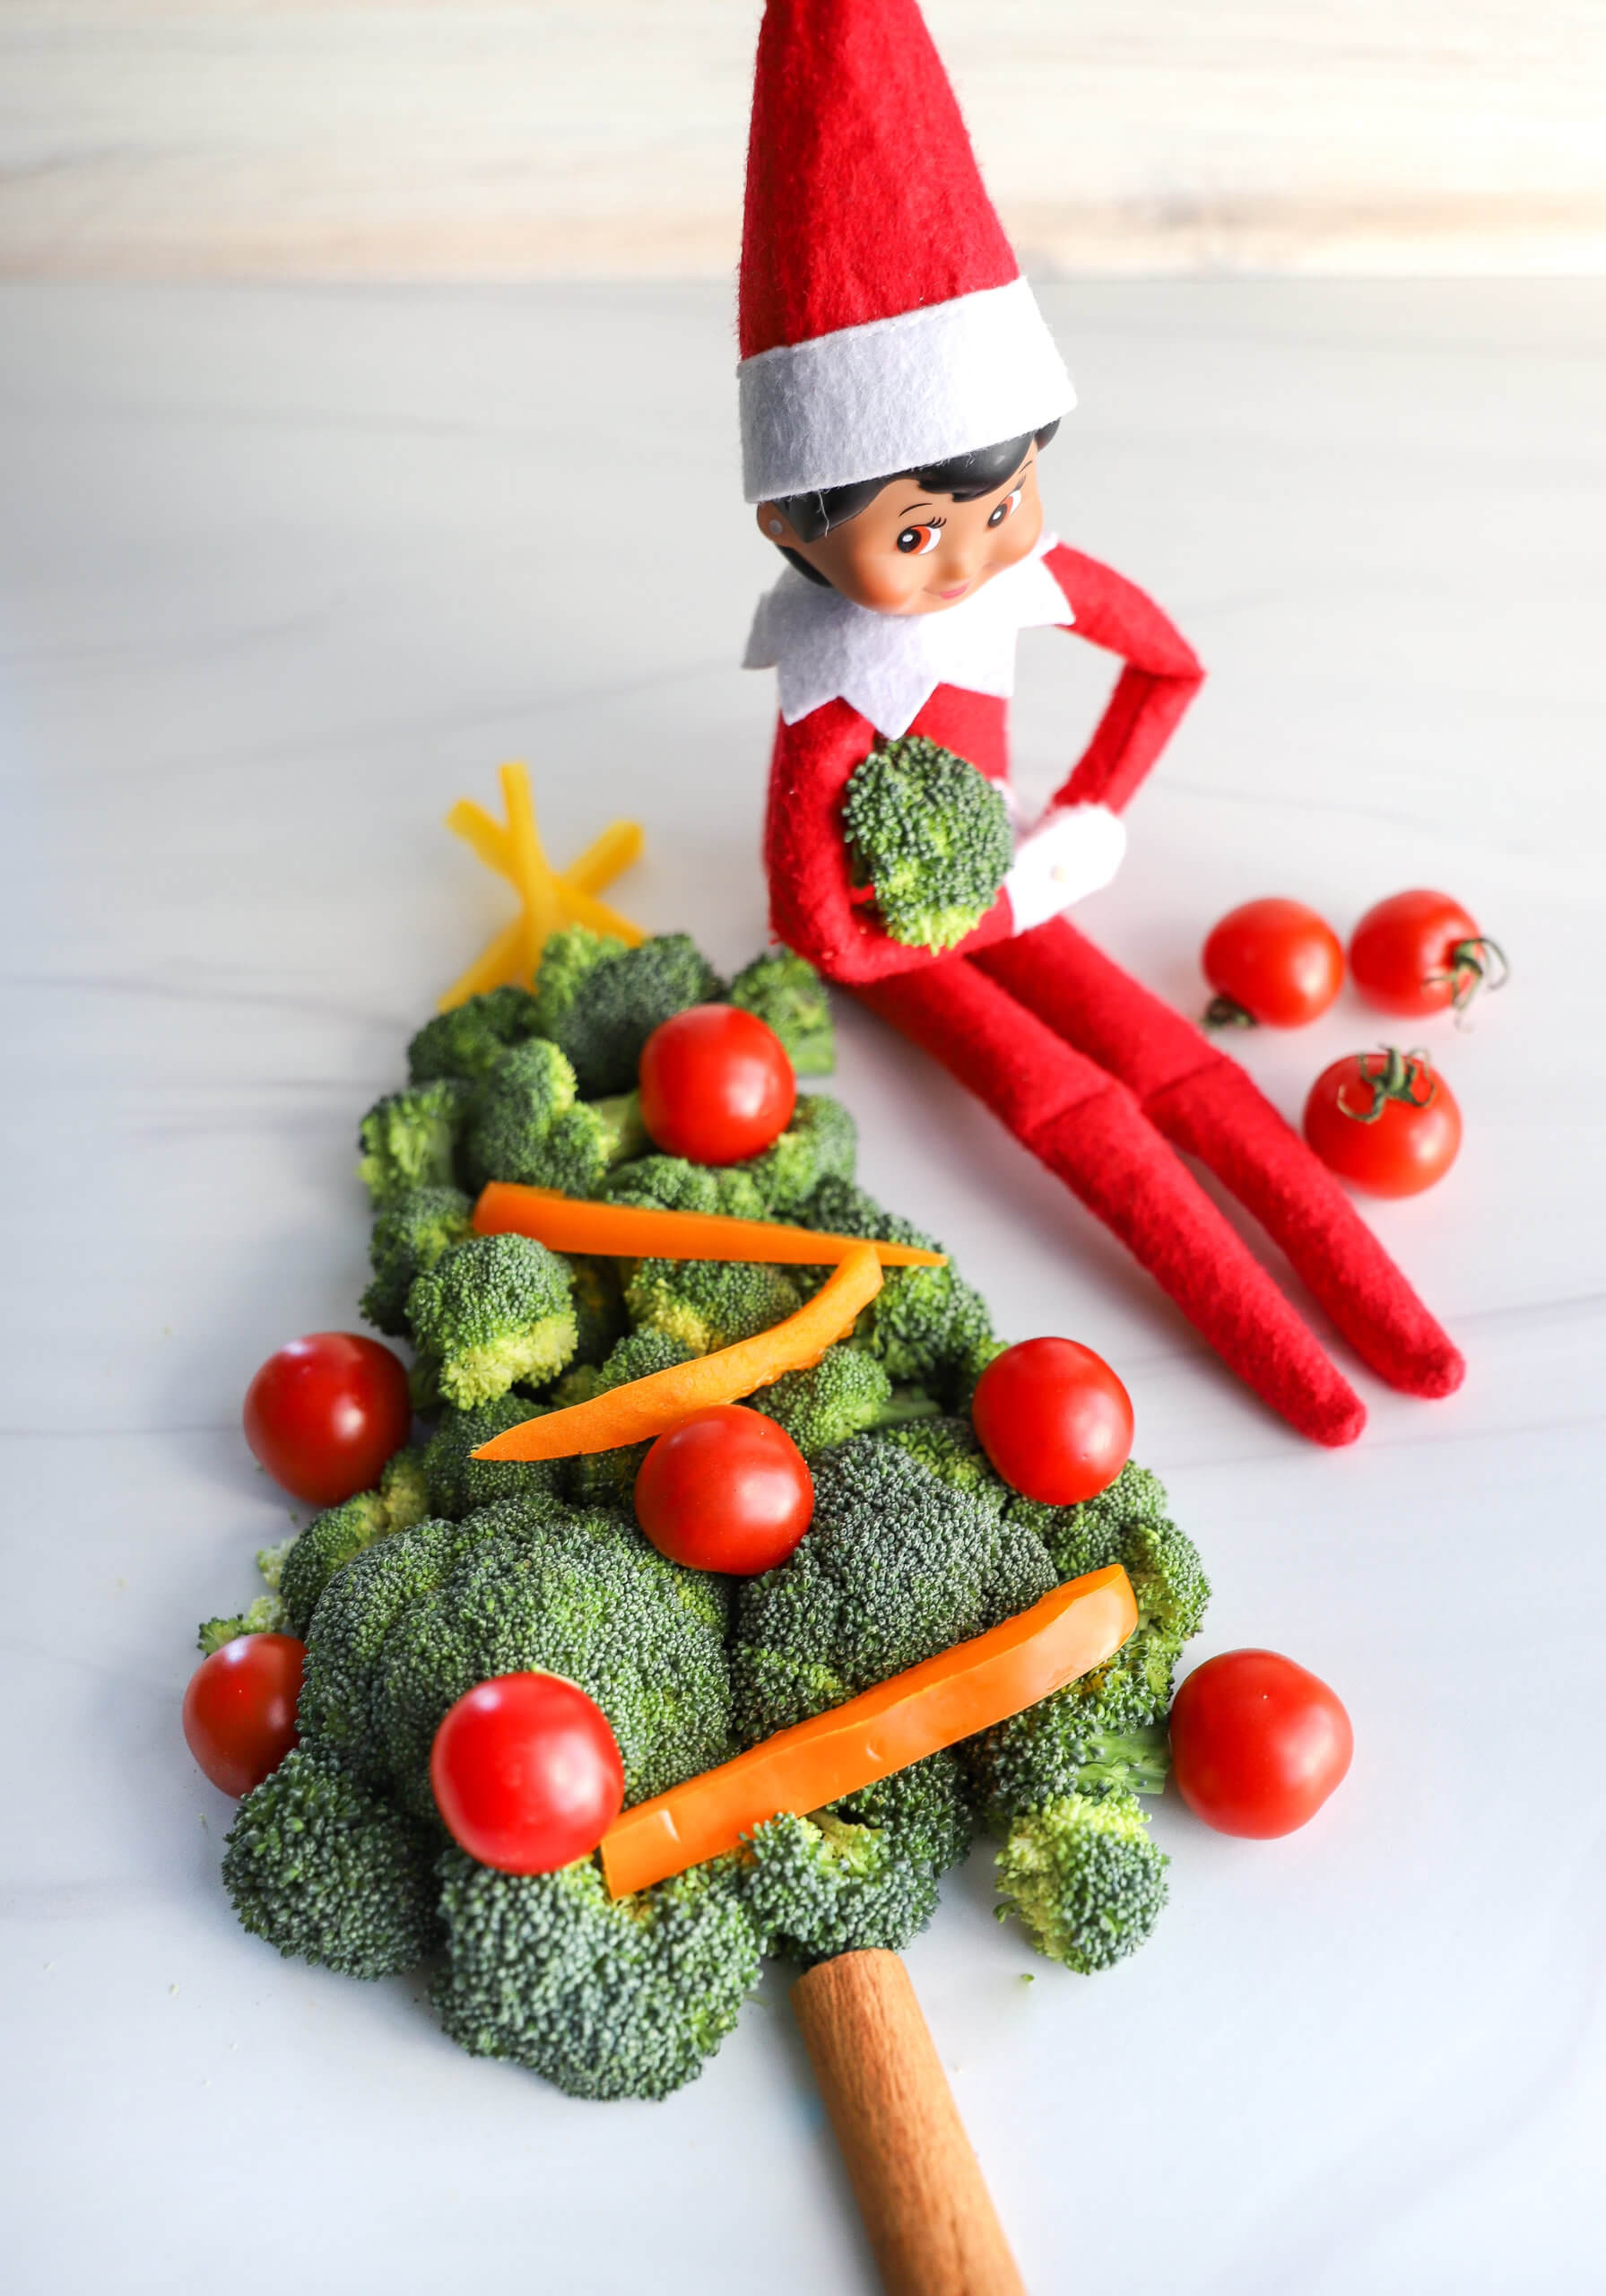 Easy Elf on the Shelf Ideas: Veggie Christmas Tree